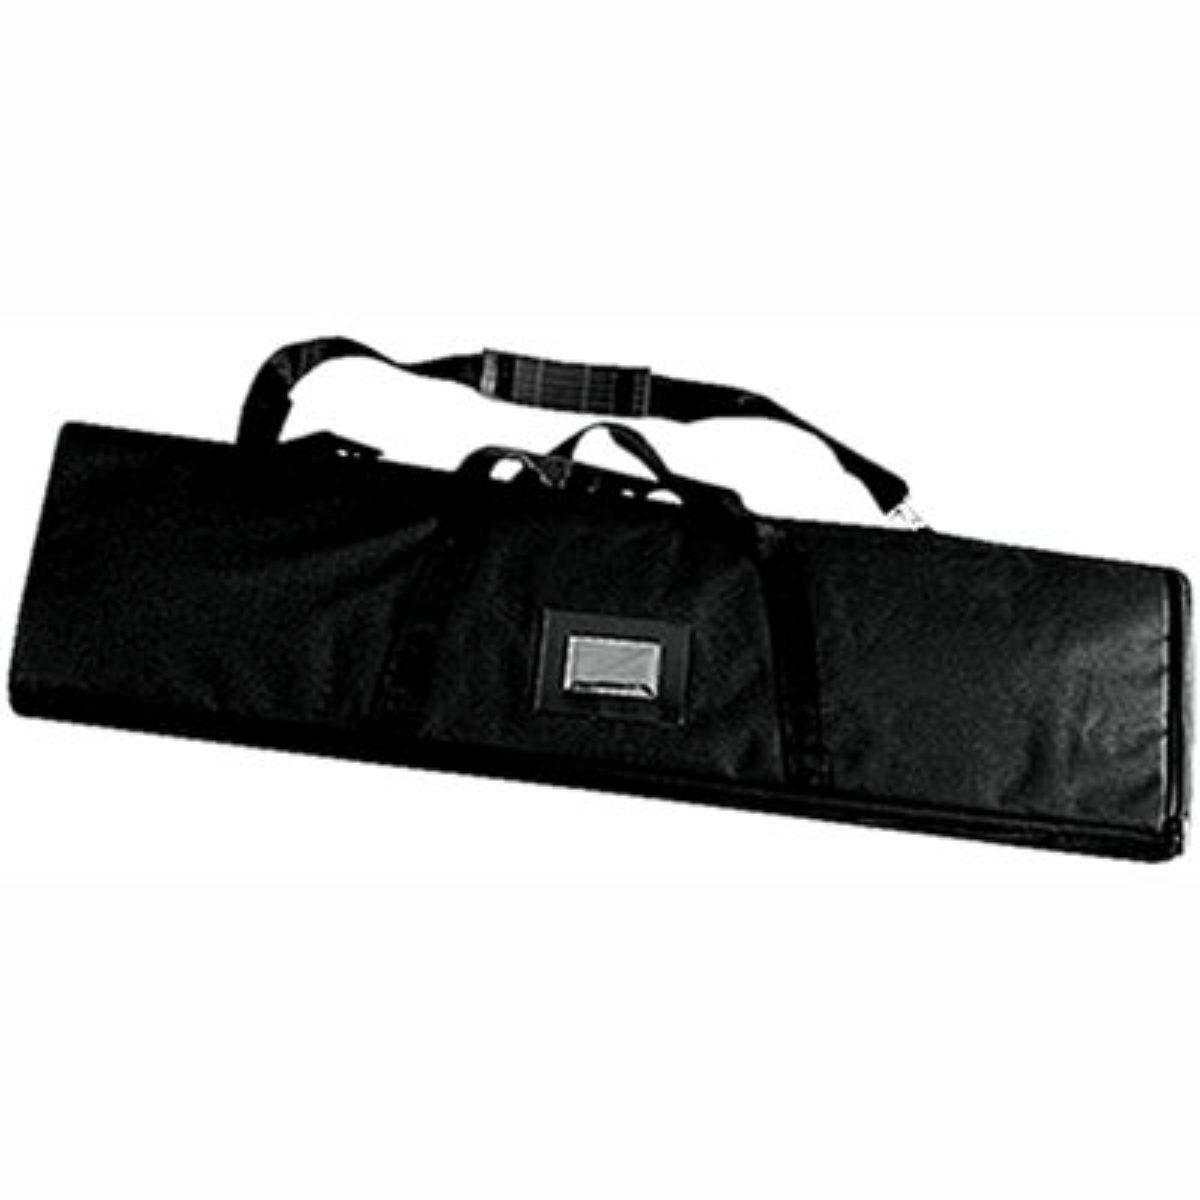 Rollup Transporttasche